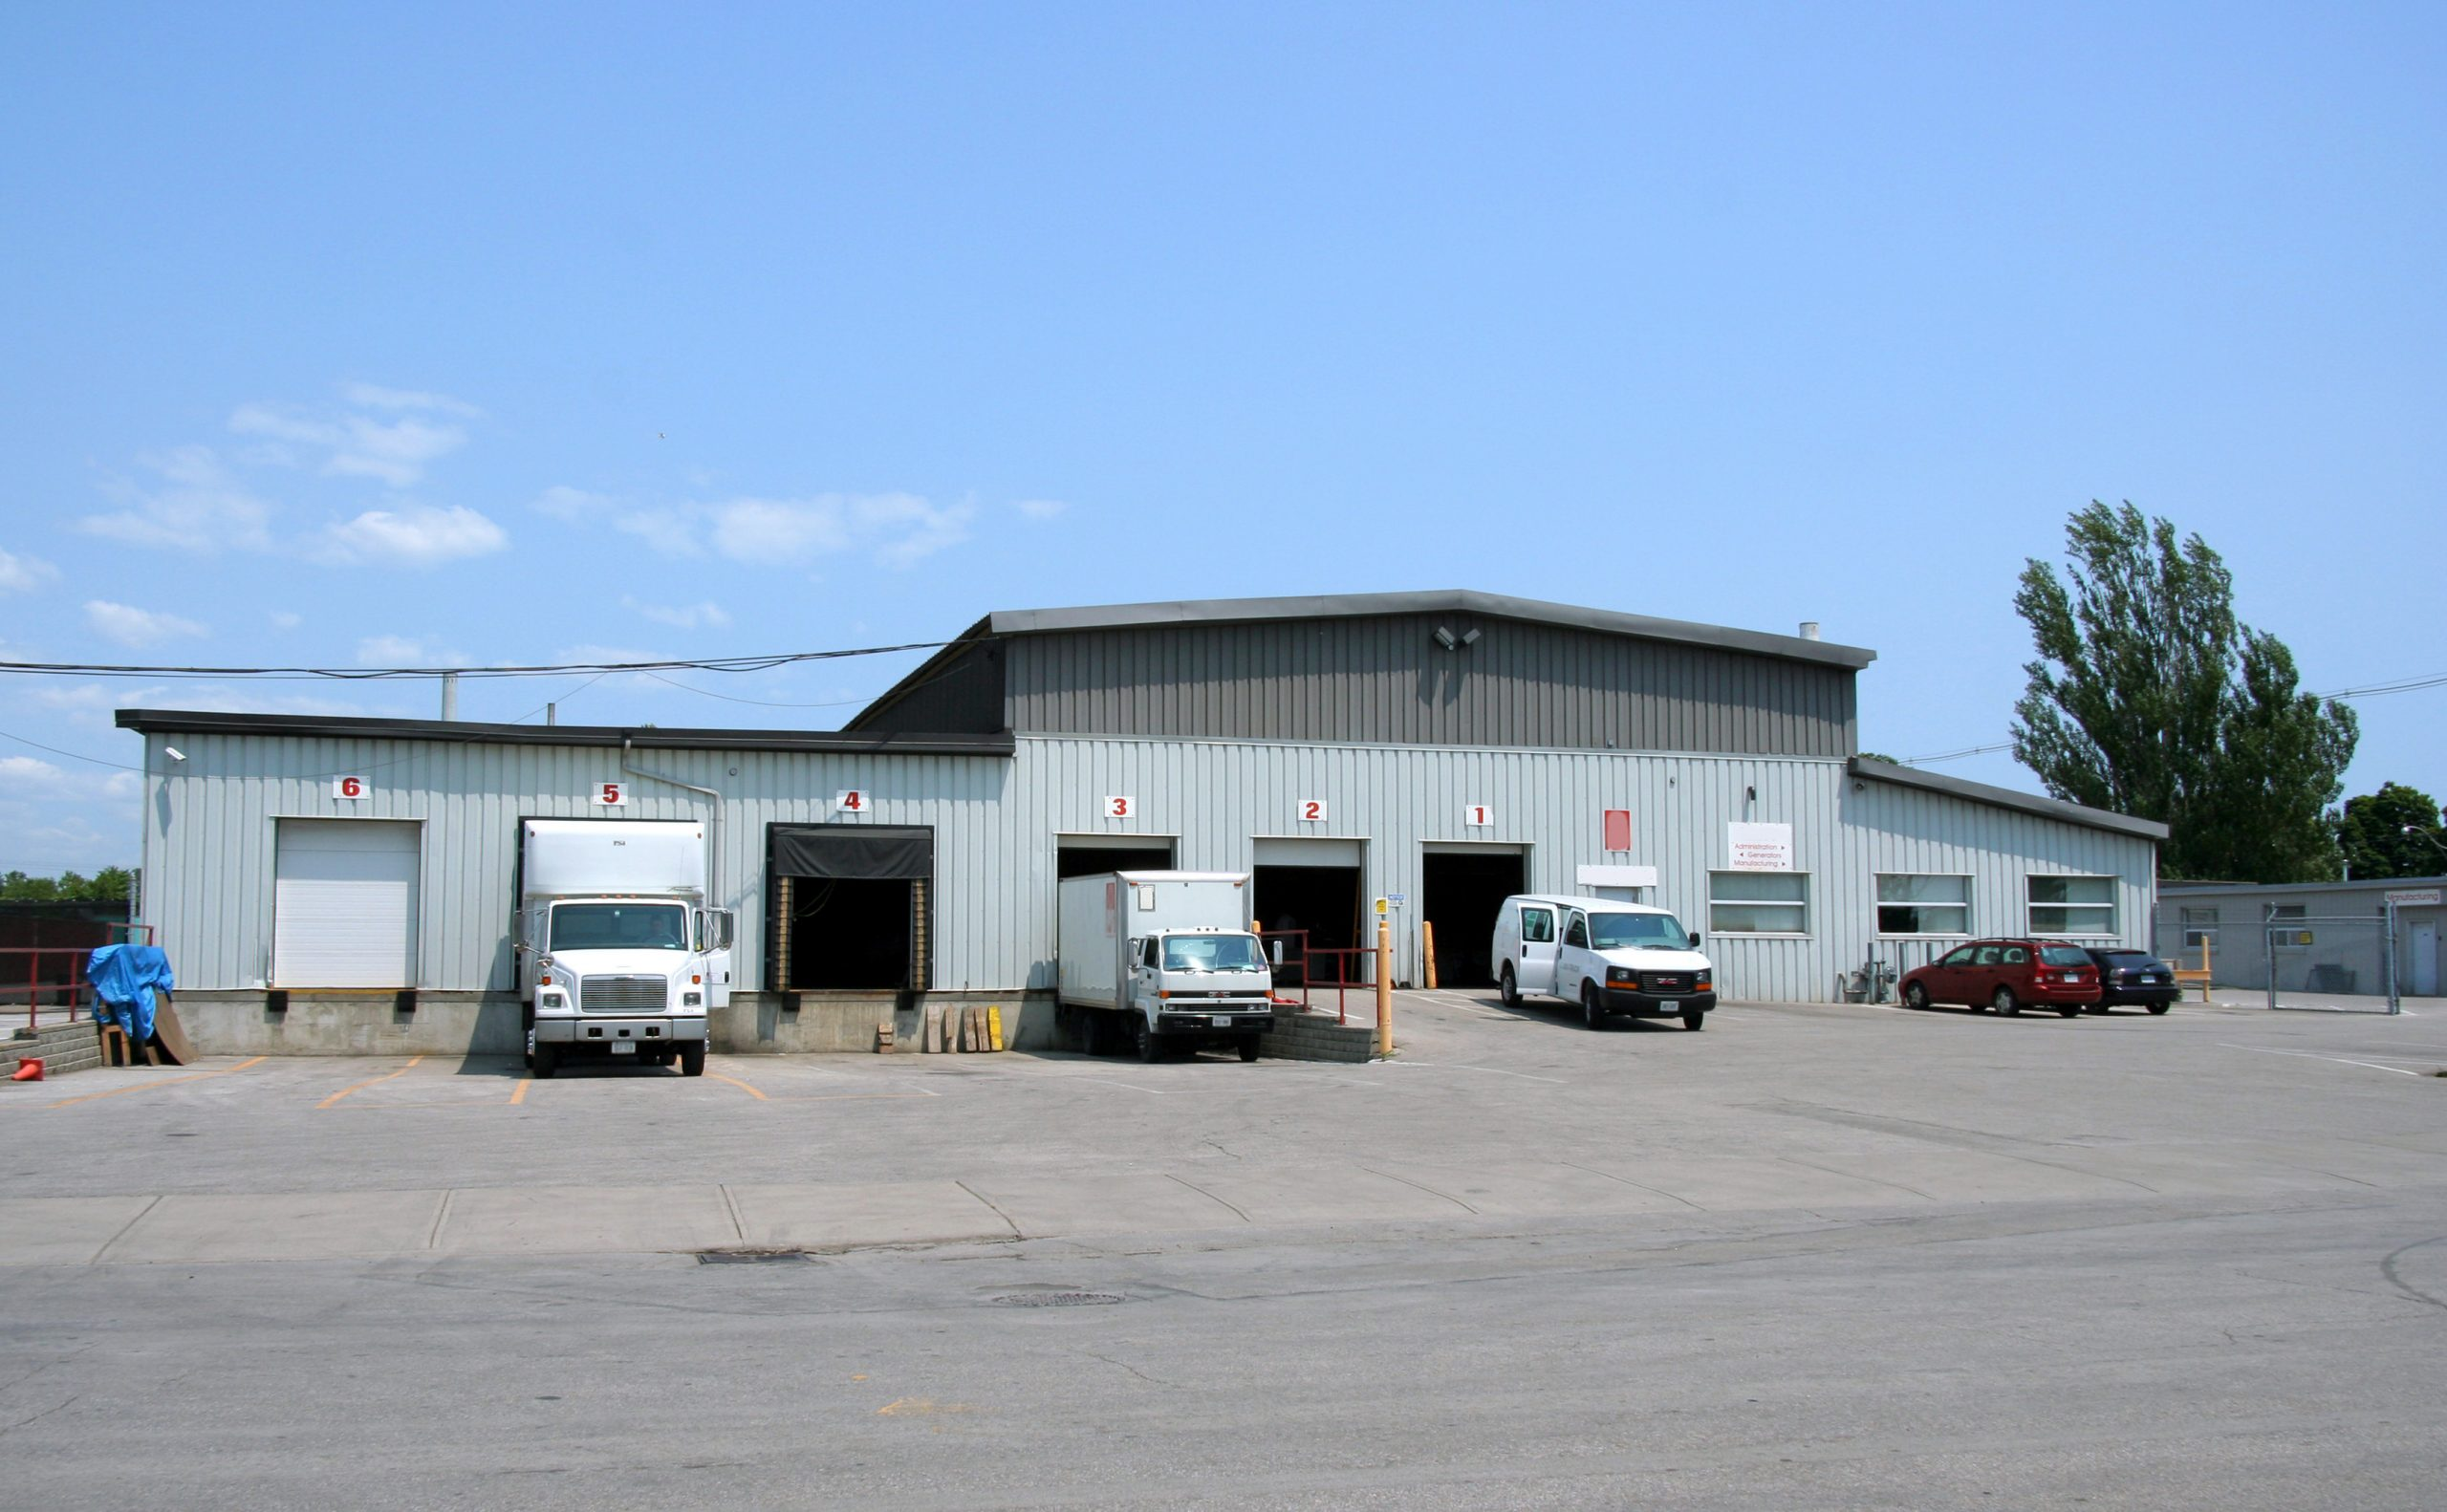 Small warehouse with trucks at loading docks.